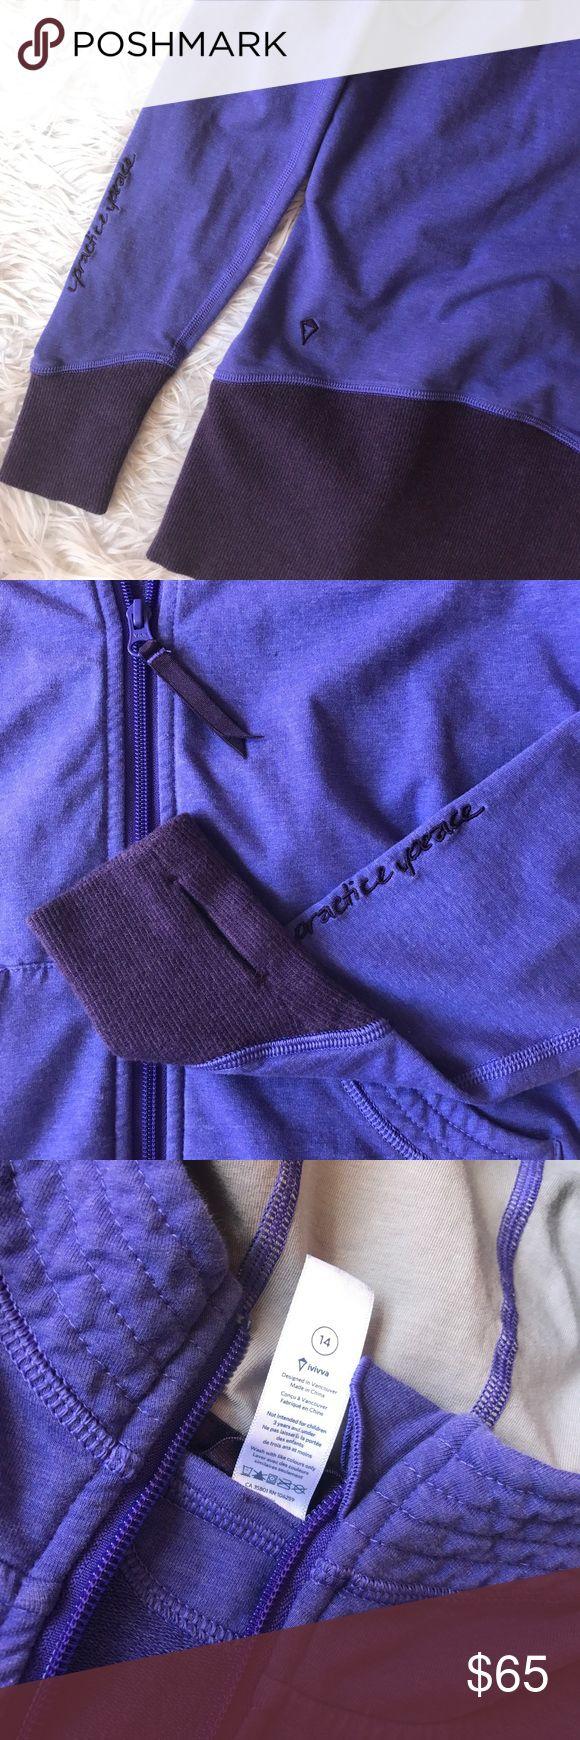 • Ivivva • Lululemon Kids Jacket Lululemon kids jacket with thumbhole detail! Ivivva Jackets & Coats